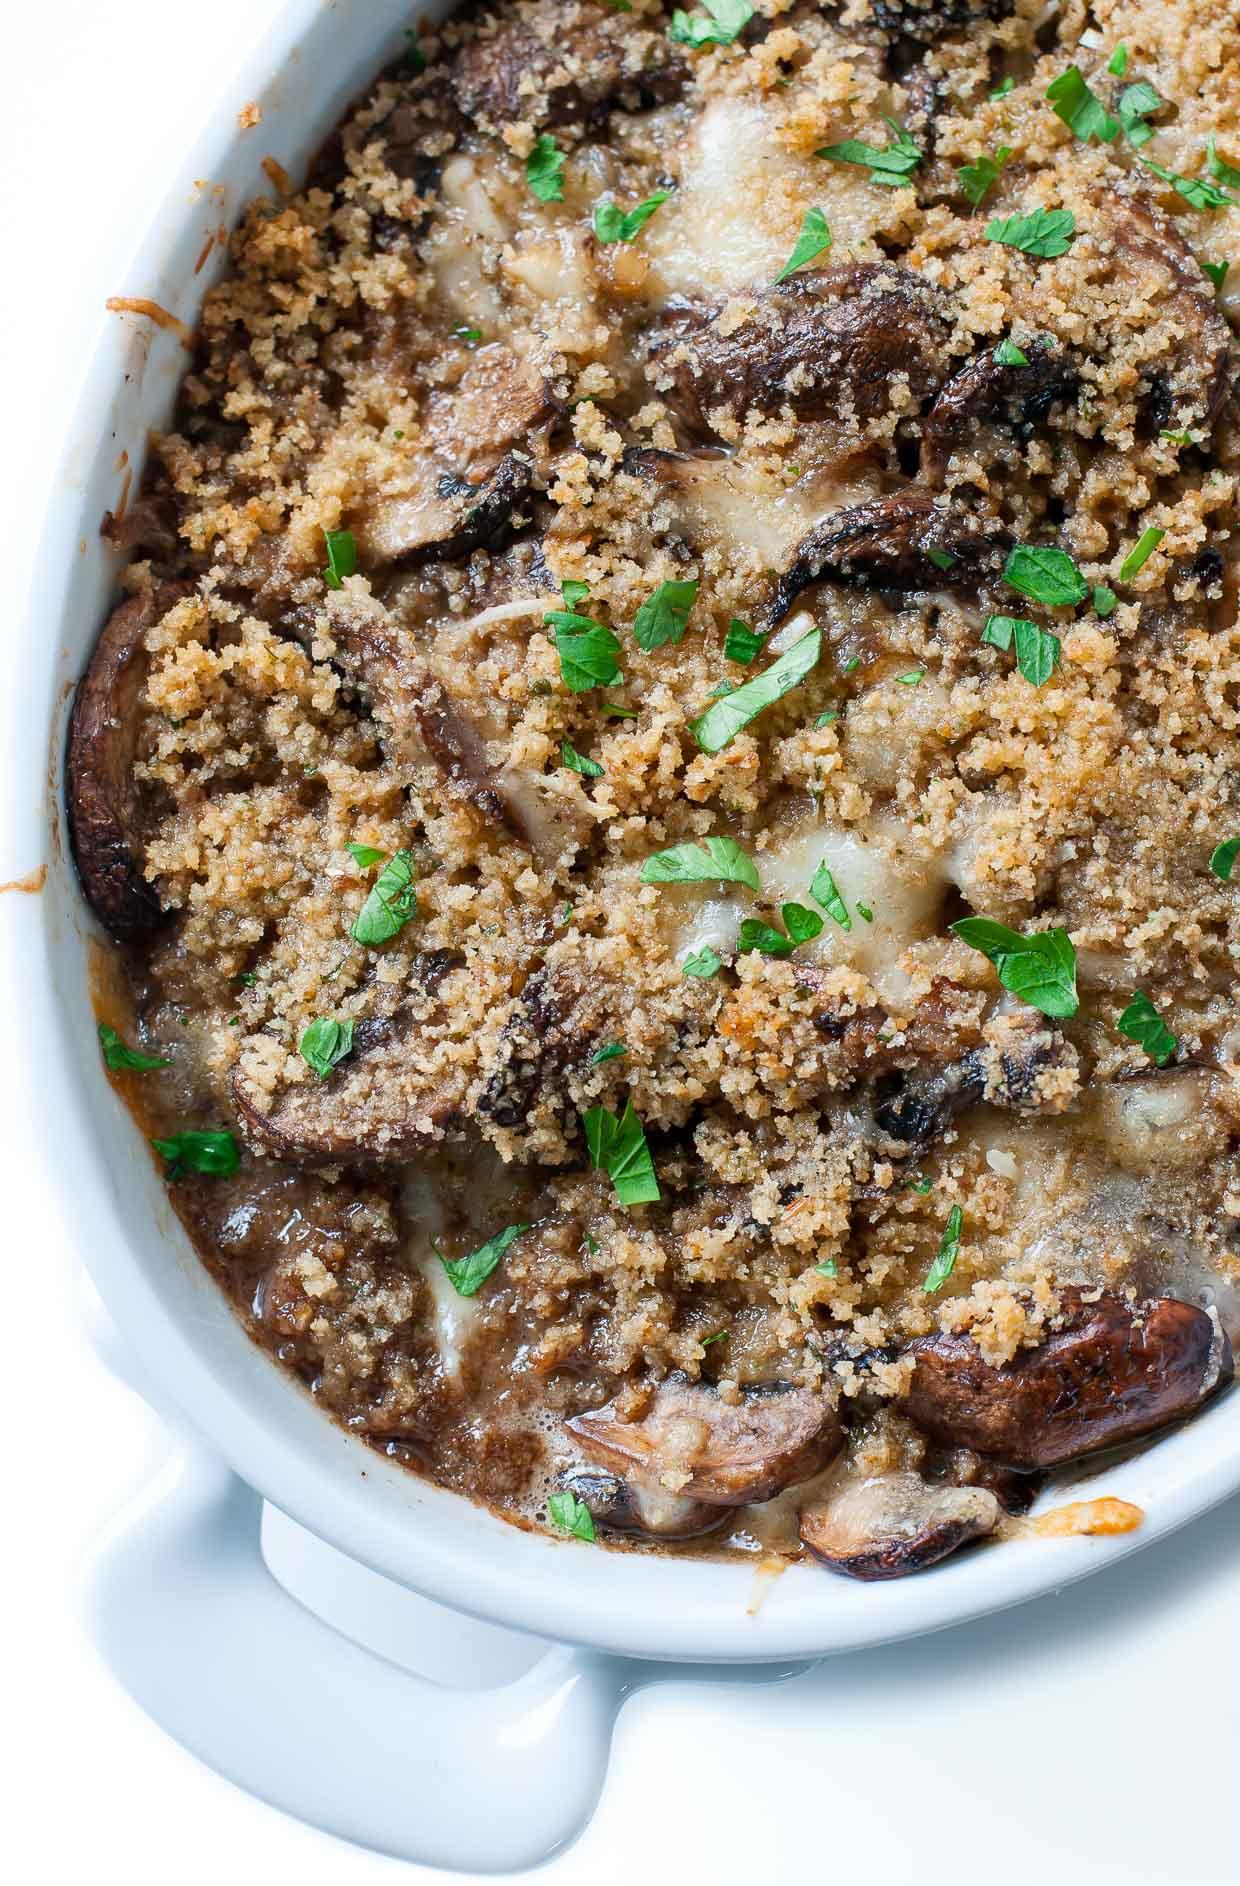 Stuffed Mushroom Casserole | Delicious And Easy Fall Recipes I Homemade Recipes | Cozy Dinner Ideas